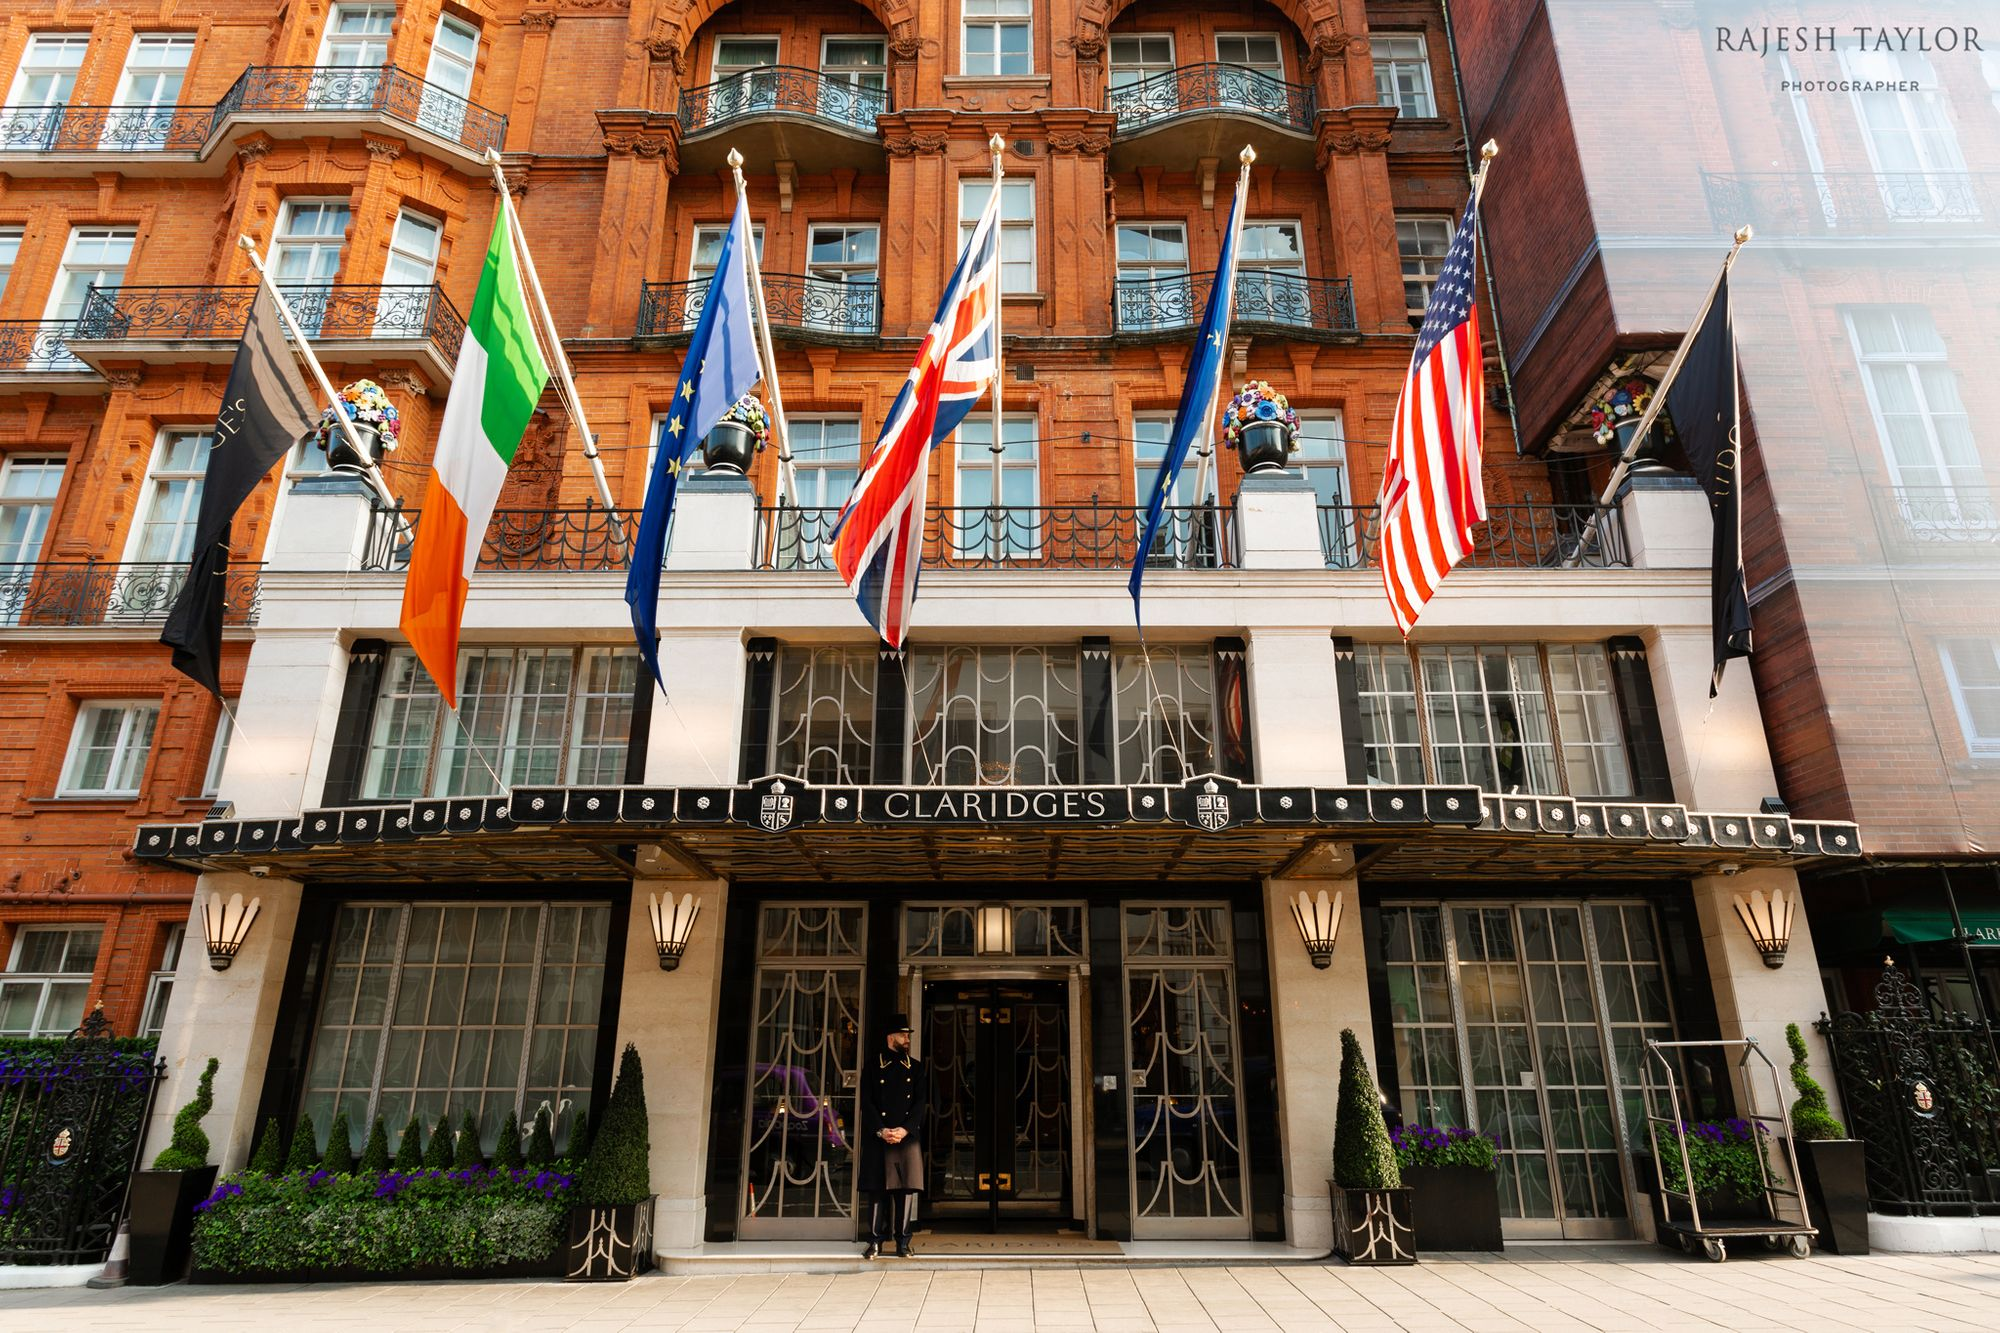 Claridge's Hotel, Mayfair © Rajesh Taylor